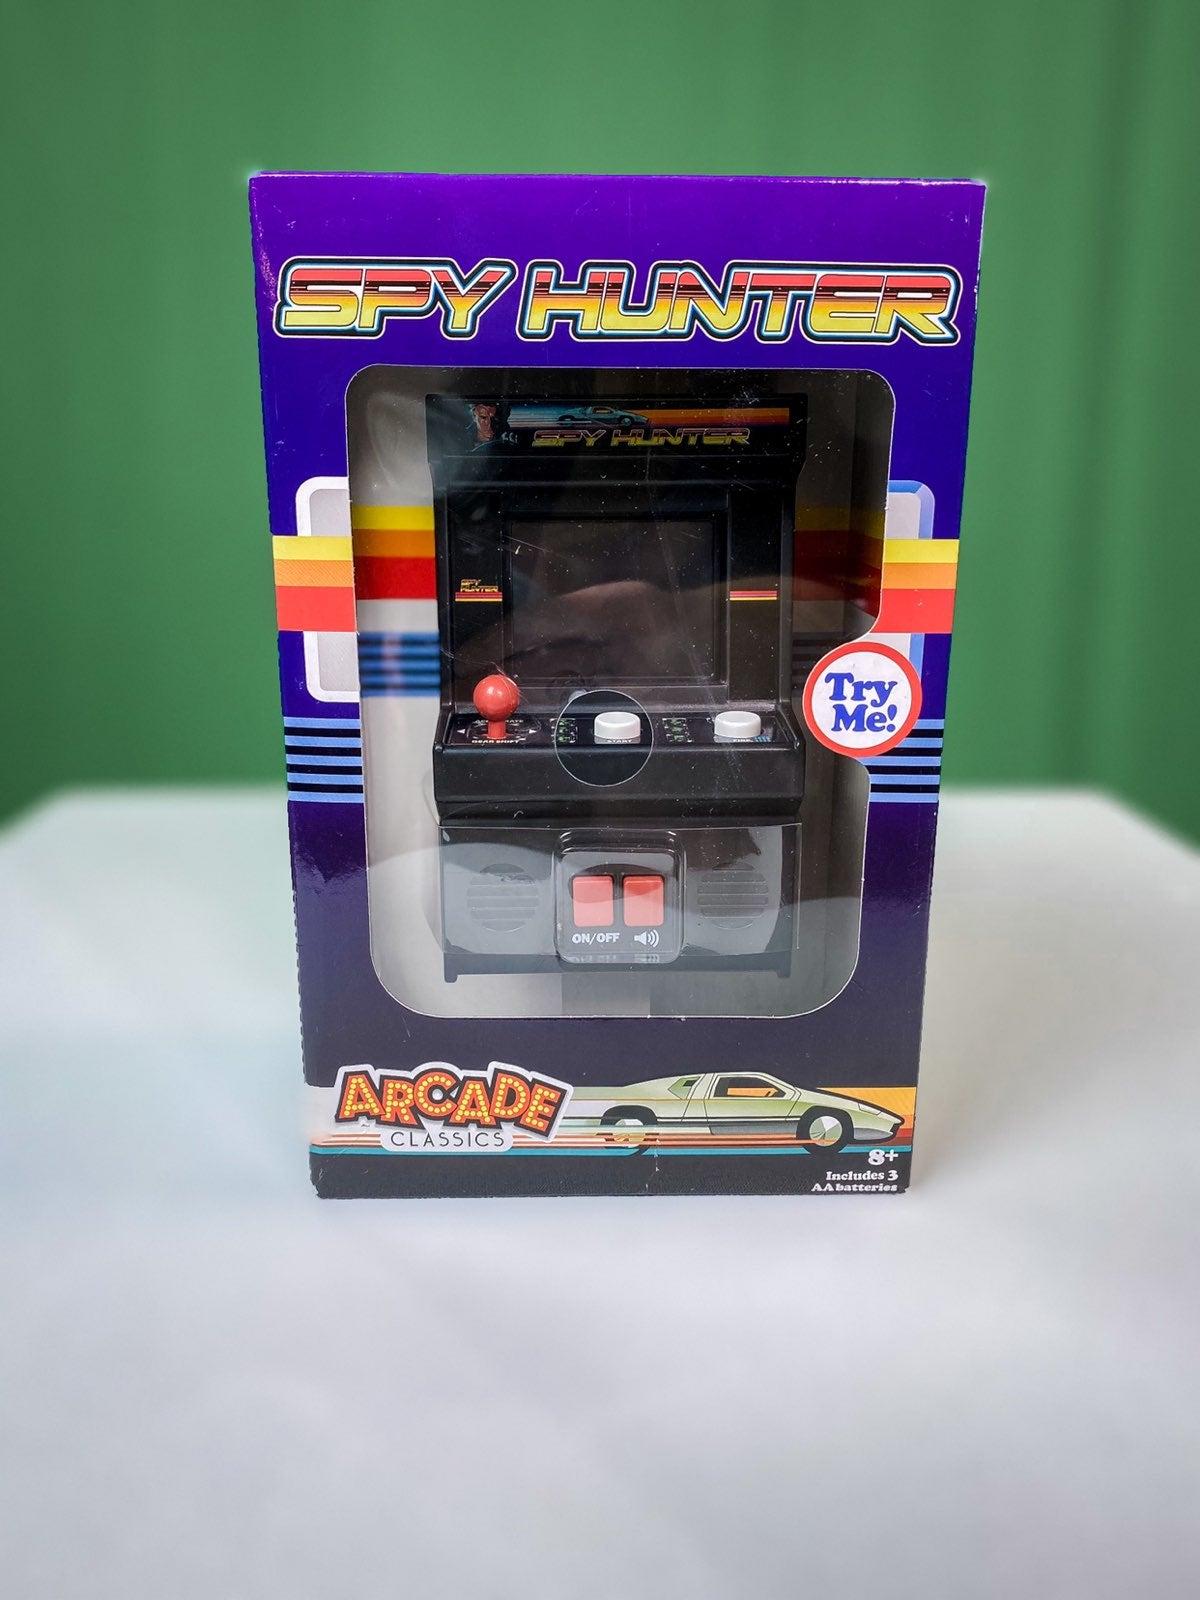 Spy hunter classic arcade games